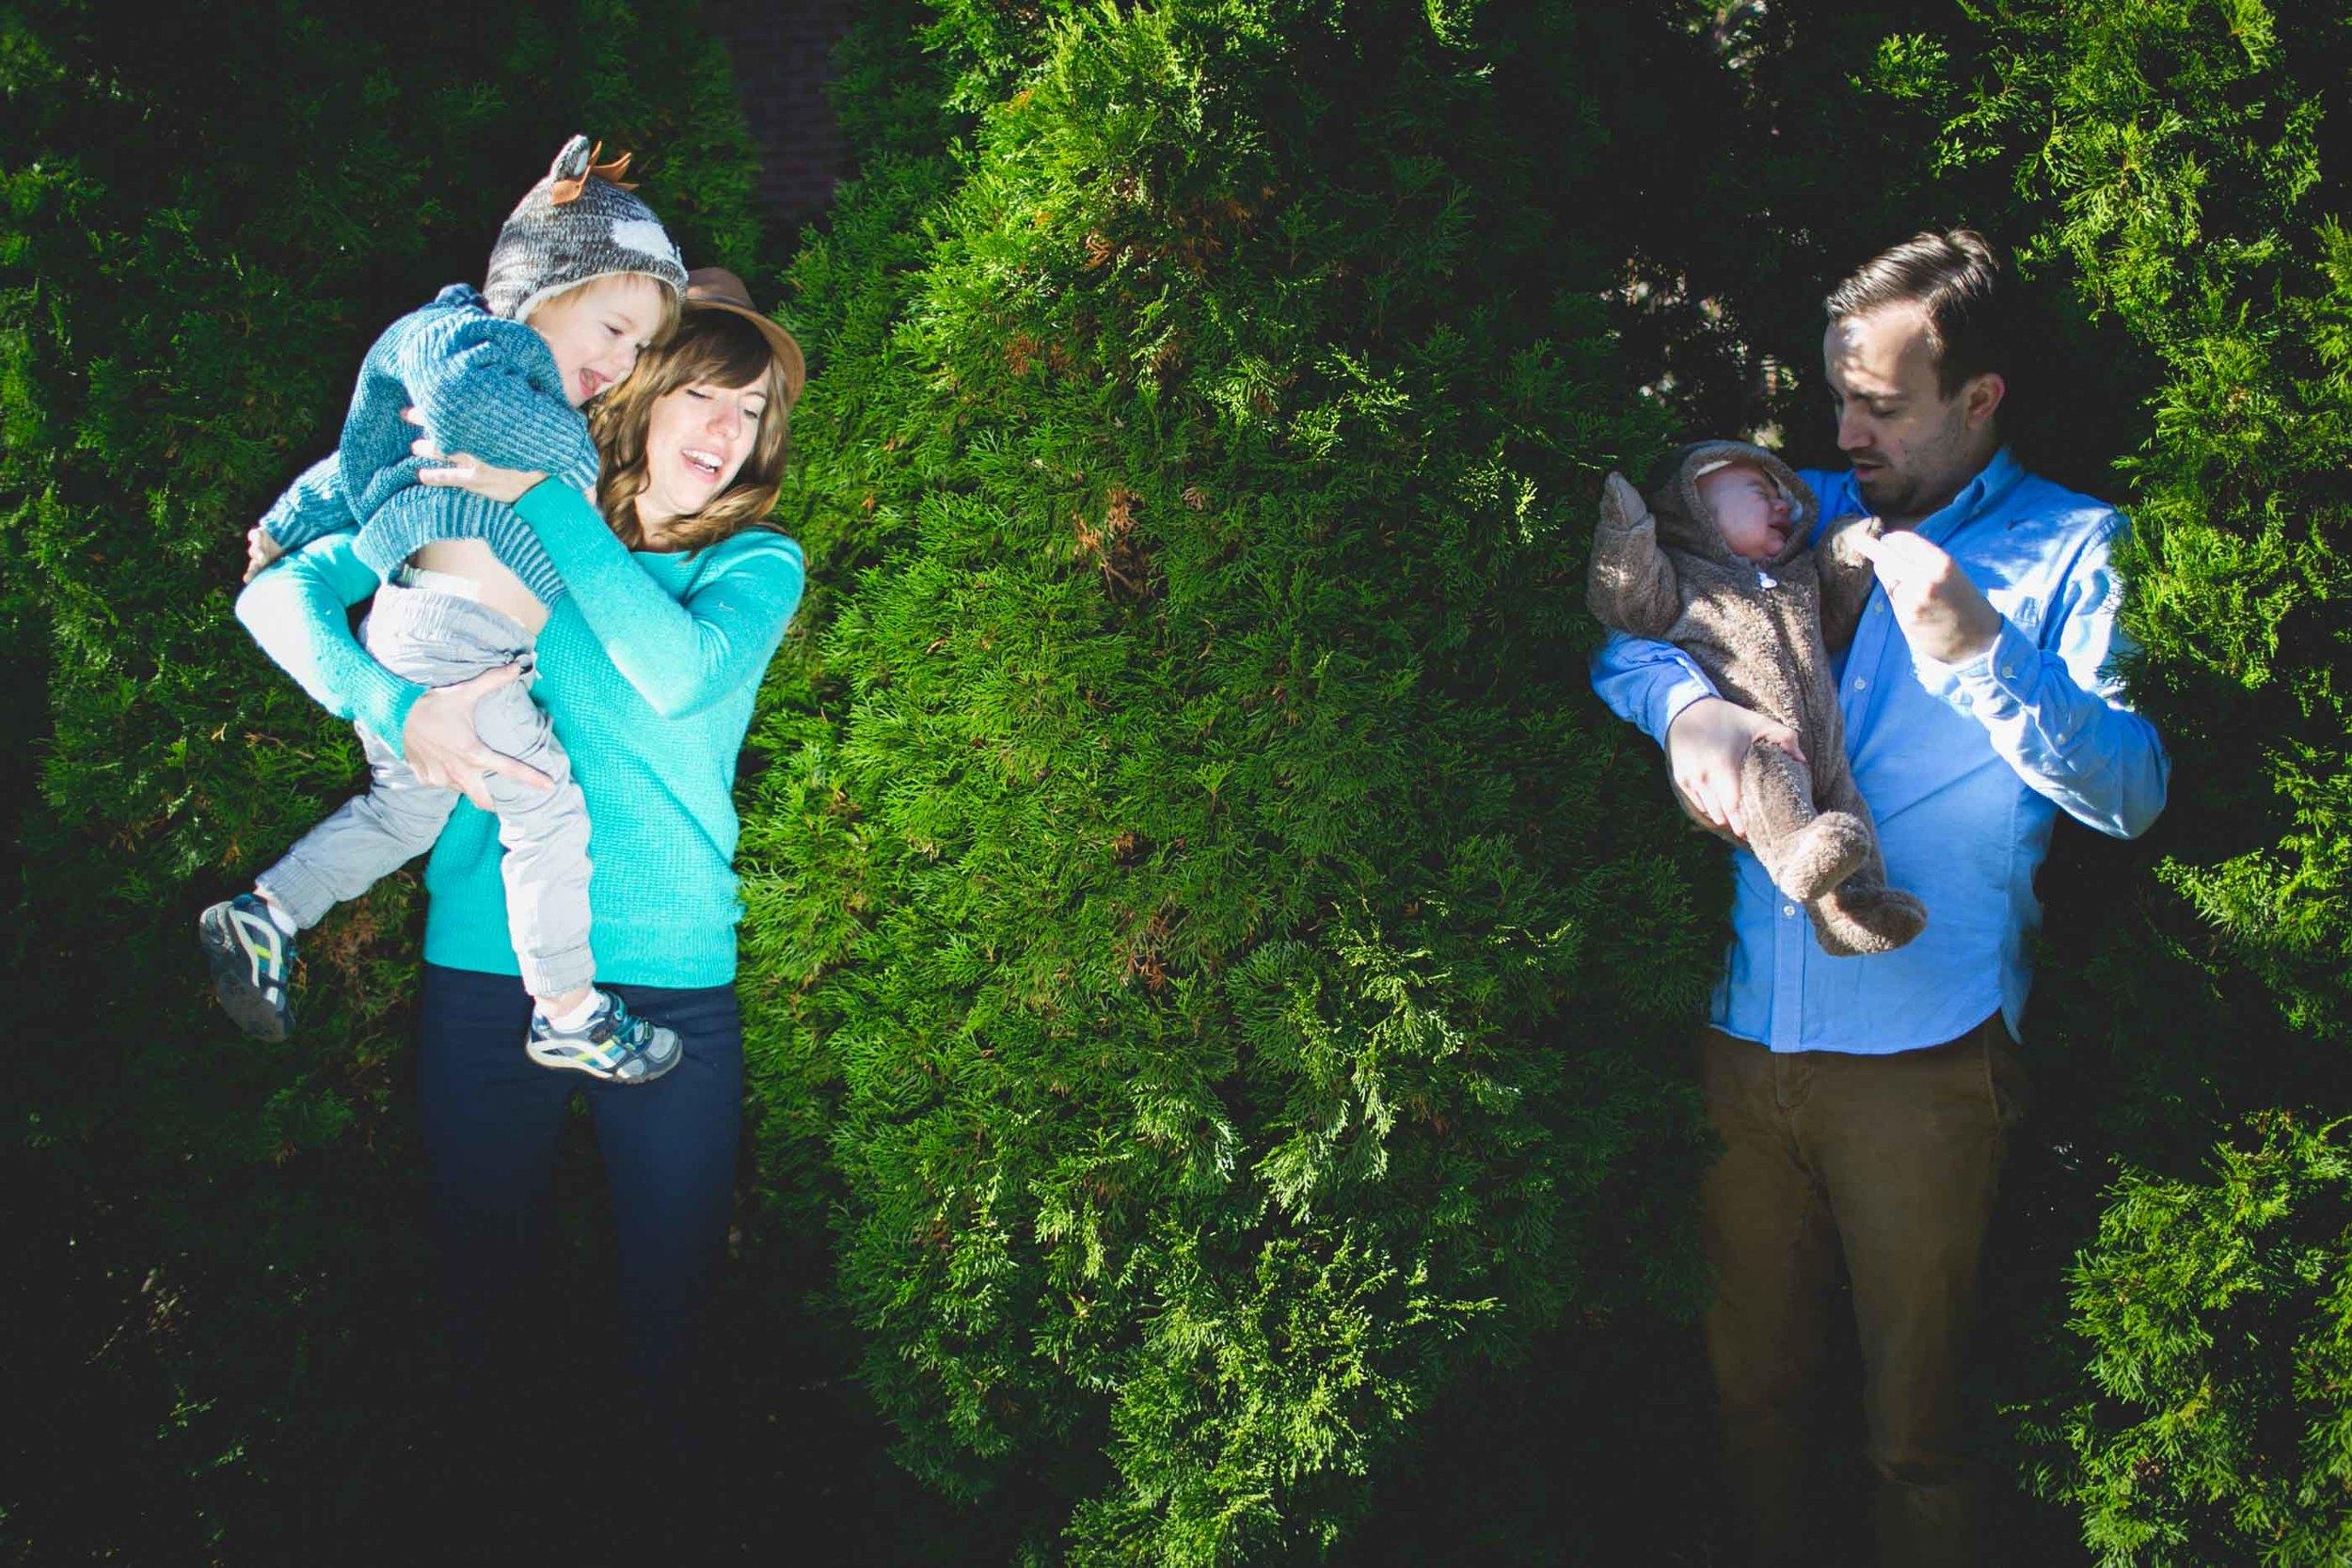 Family-Photographer-Beverly-MA-4-12.jpg